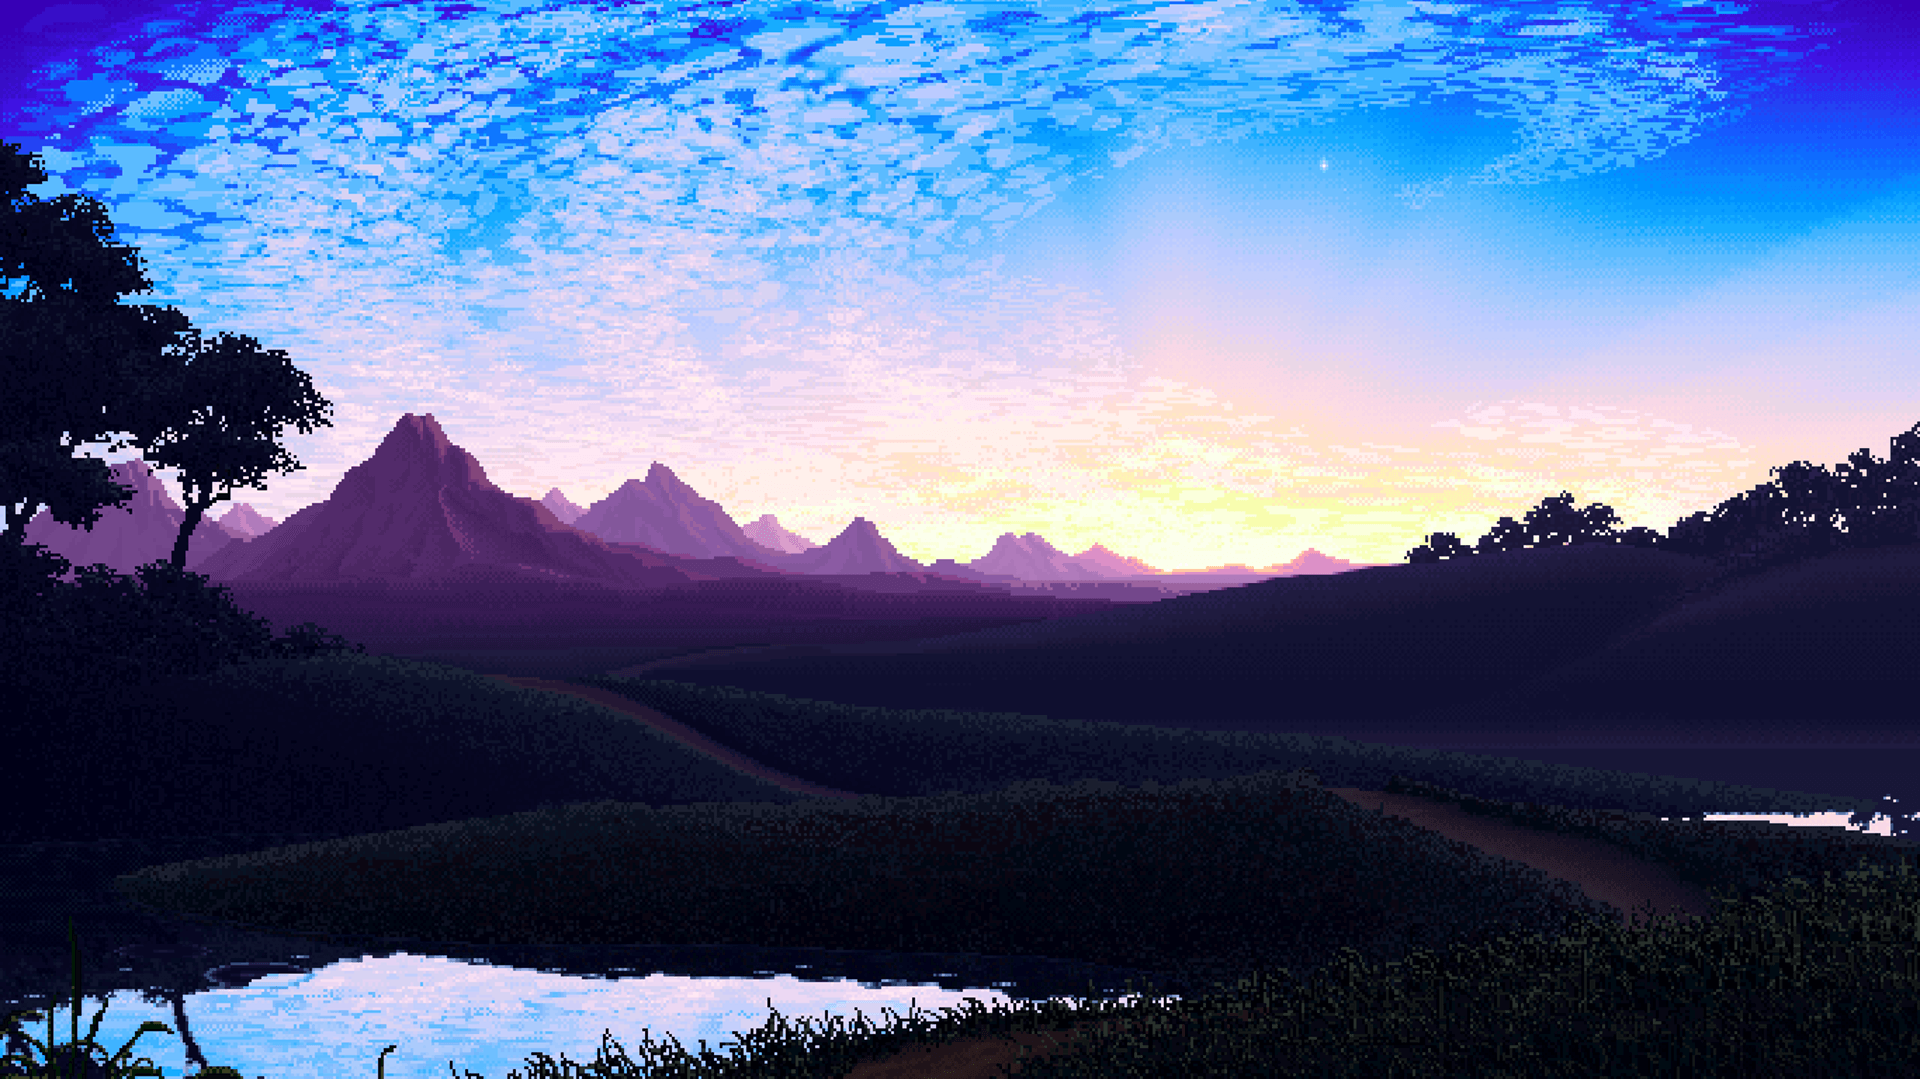 Pixel Art Wallpapers Top Free Pixel Art Backgrounds Wallpaperaccess